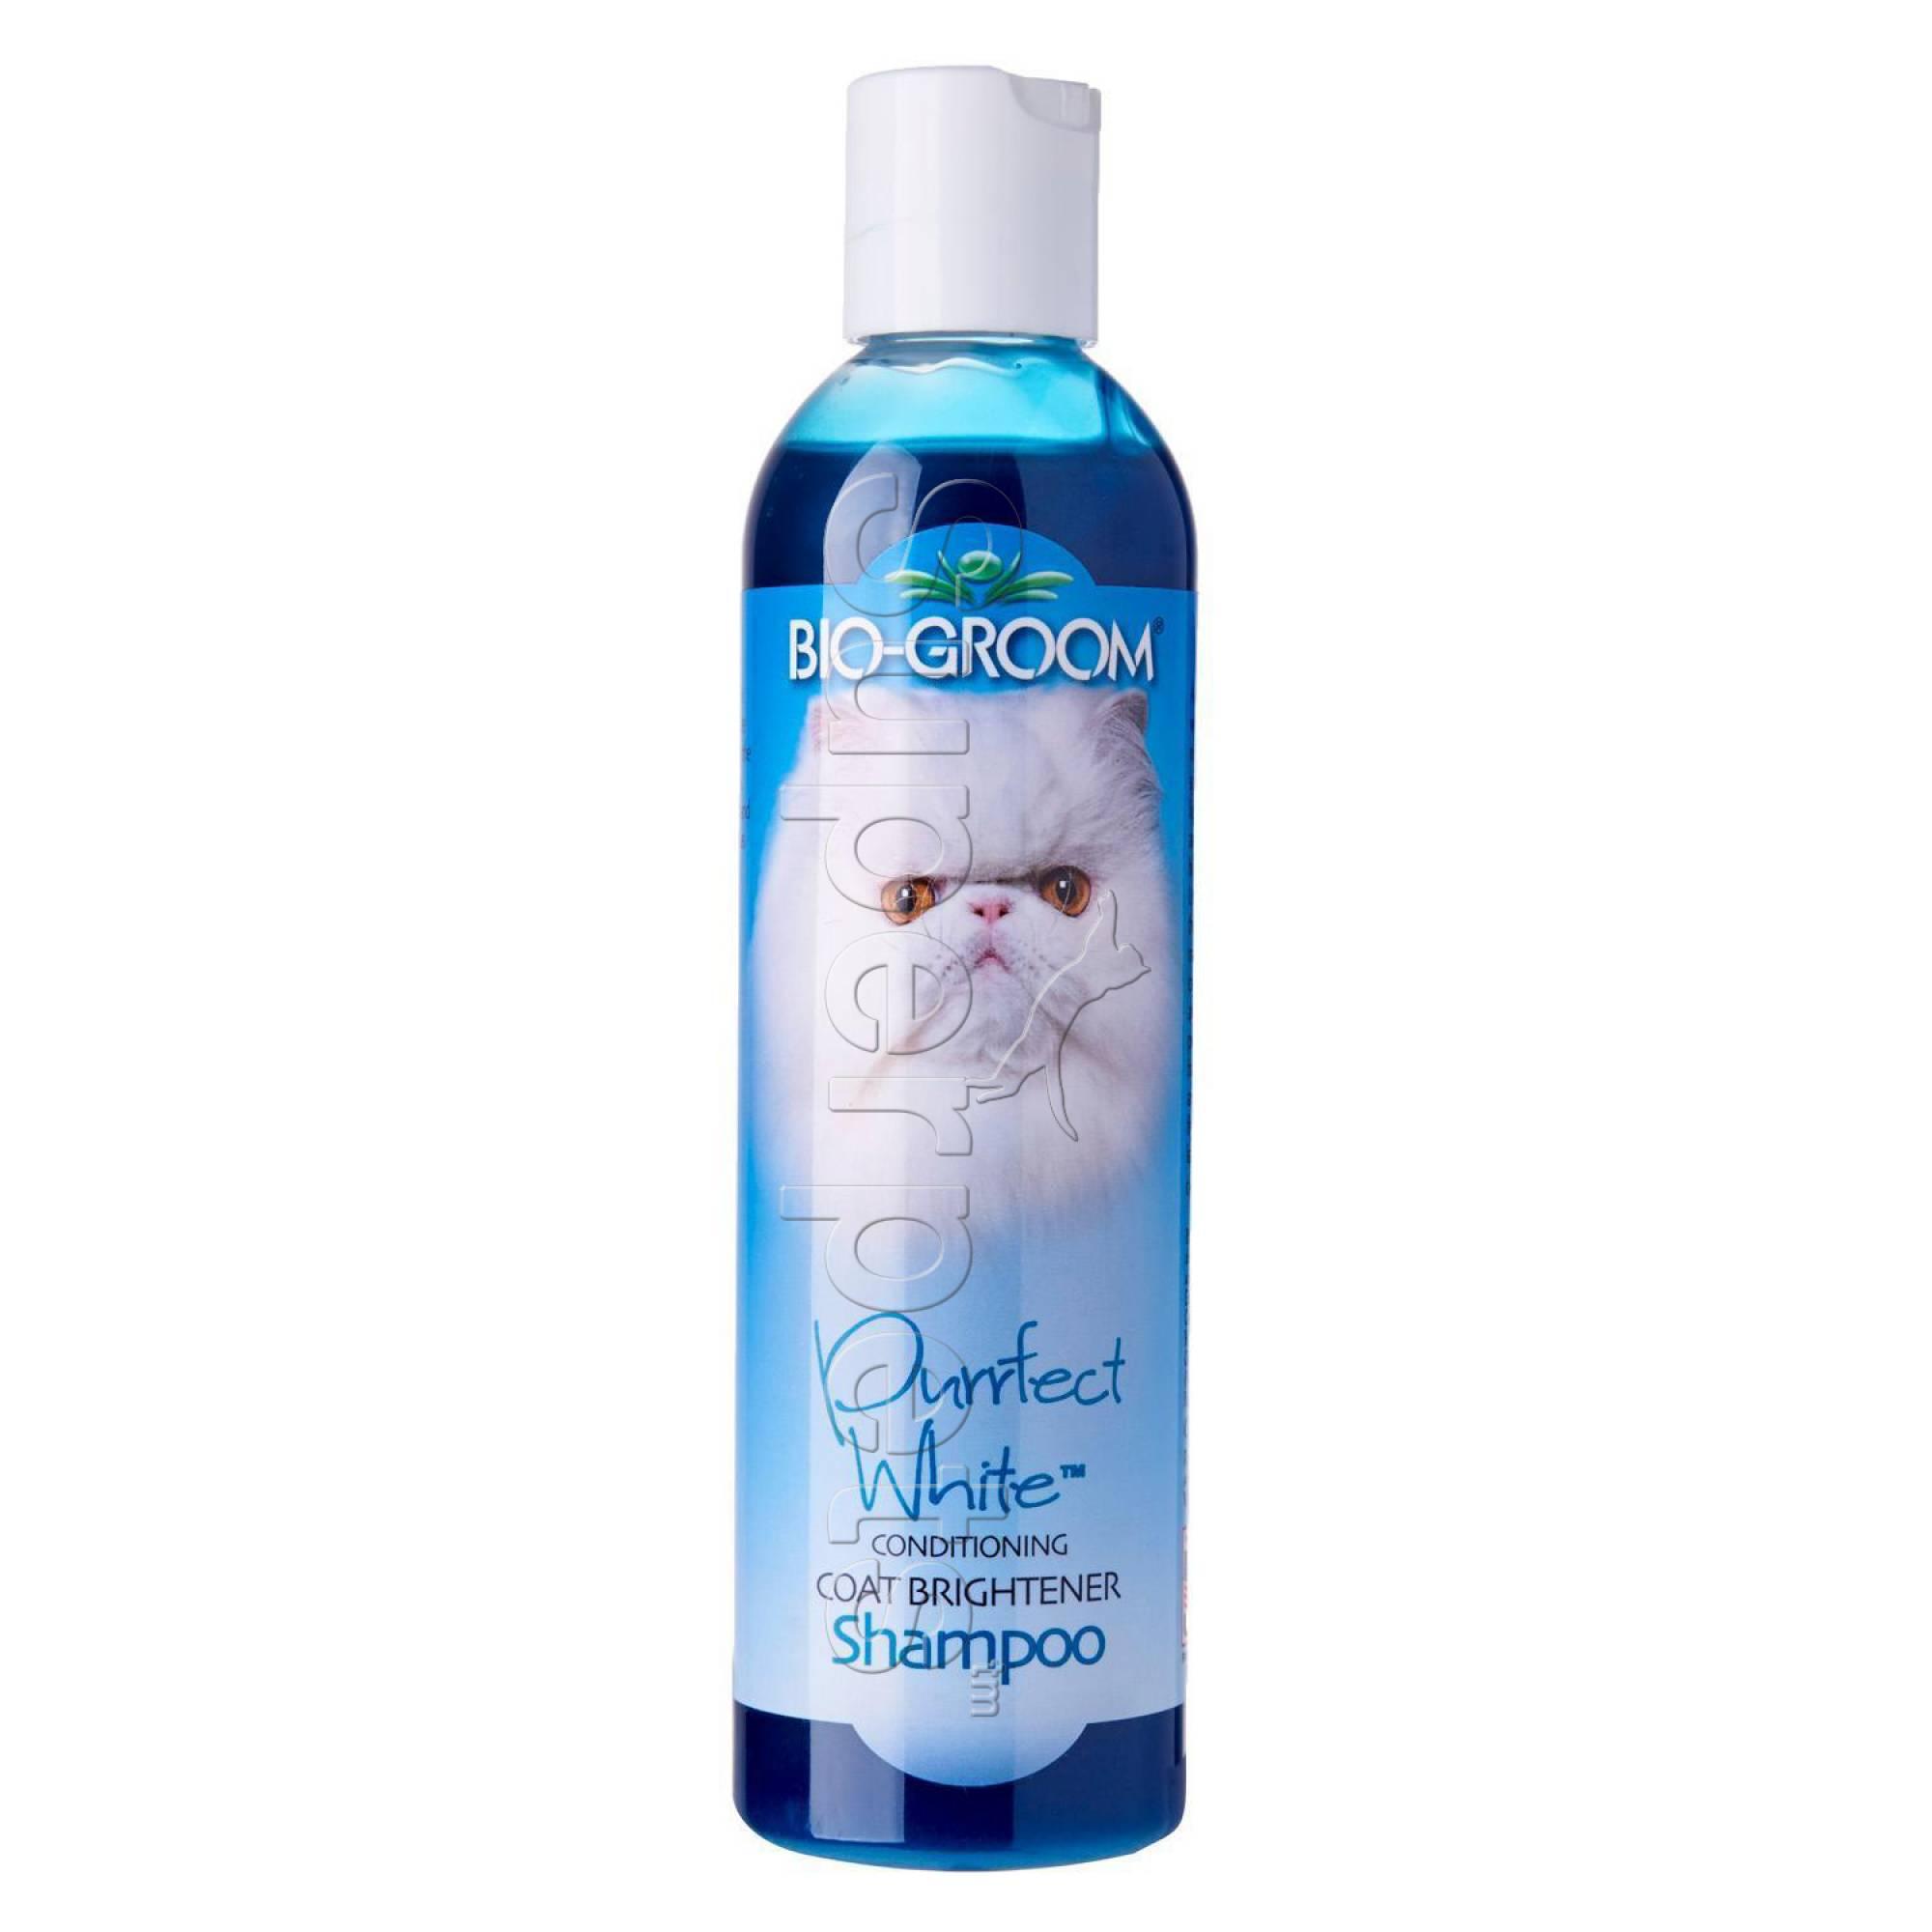 Bio-Groom Purrfect White Conditioning Coat Brightener Shampoo 8oz (236ml)